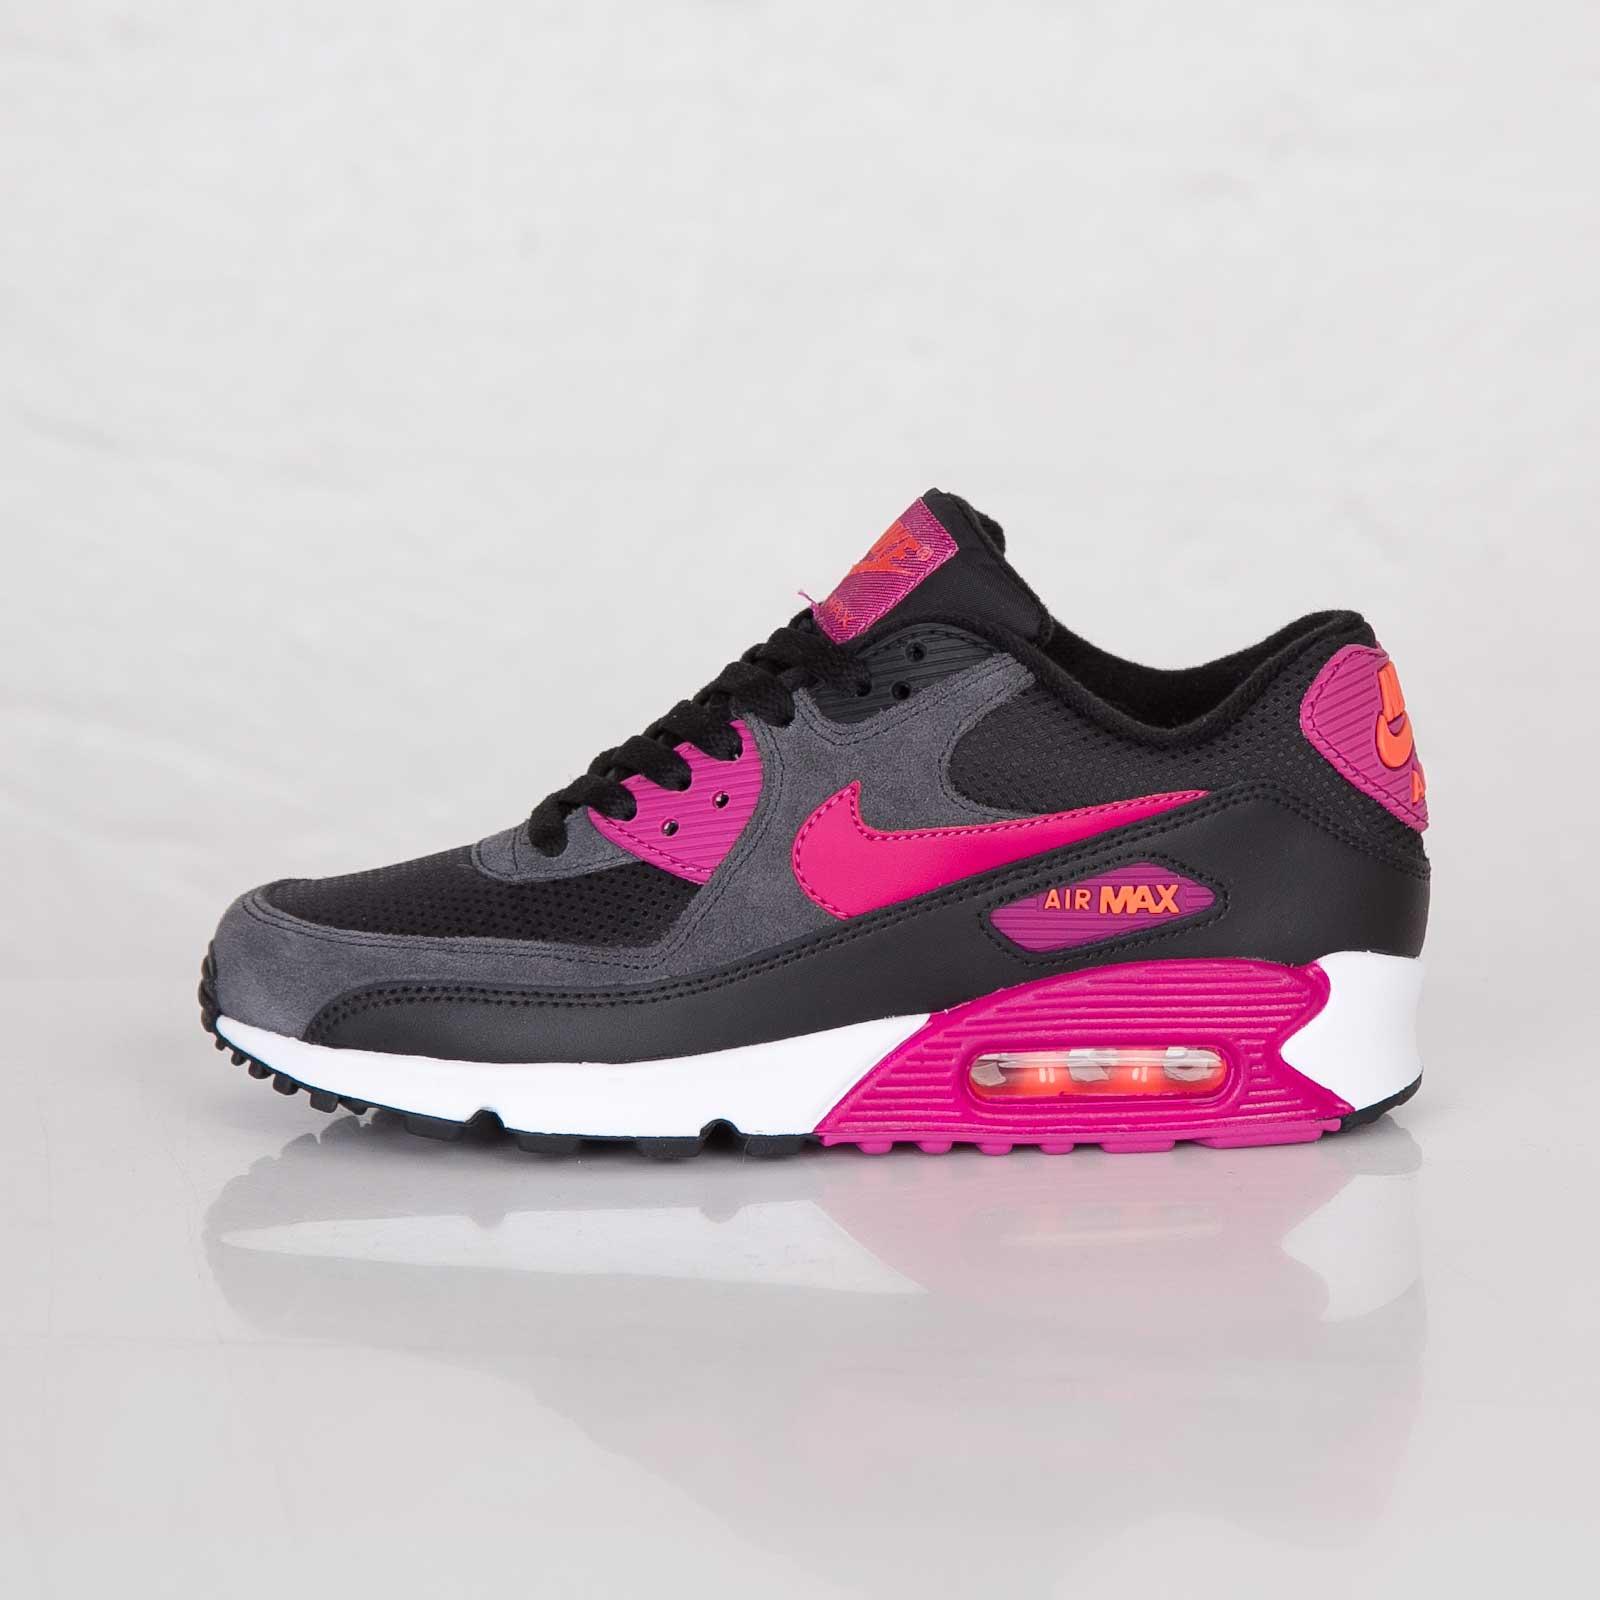 Nike Air Max 90 Essential Womens BlackBright MagentaTurf